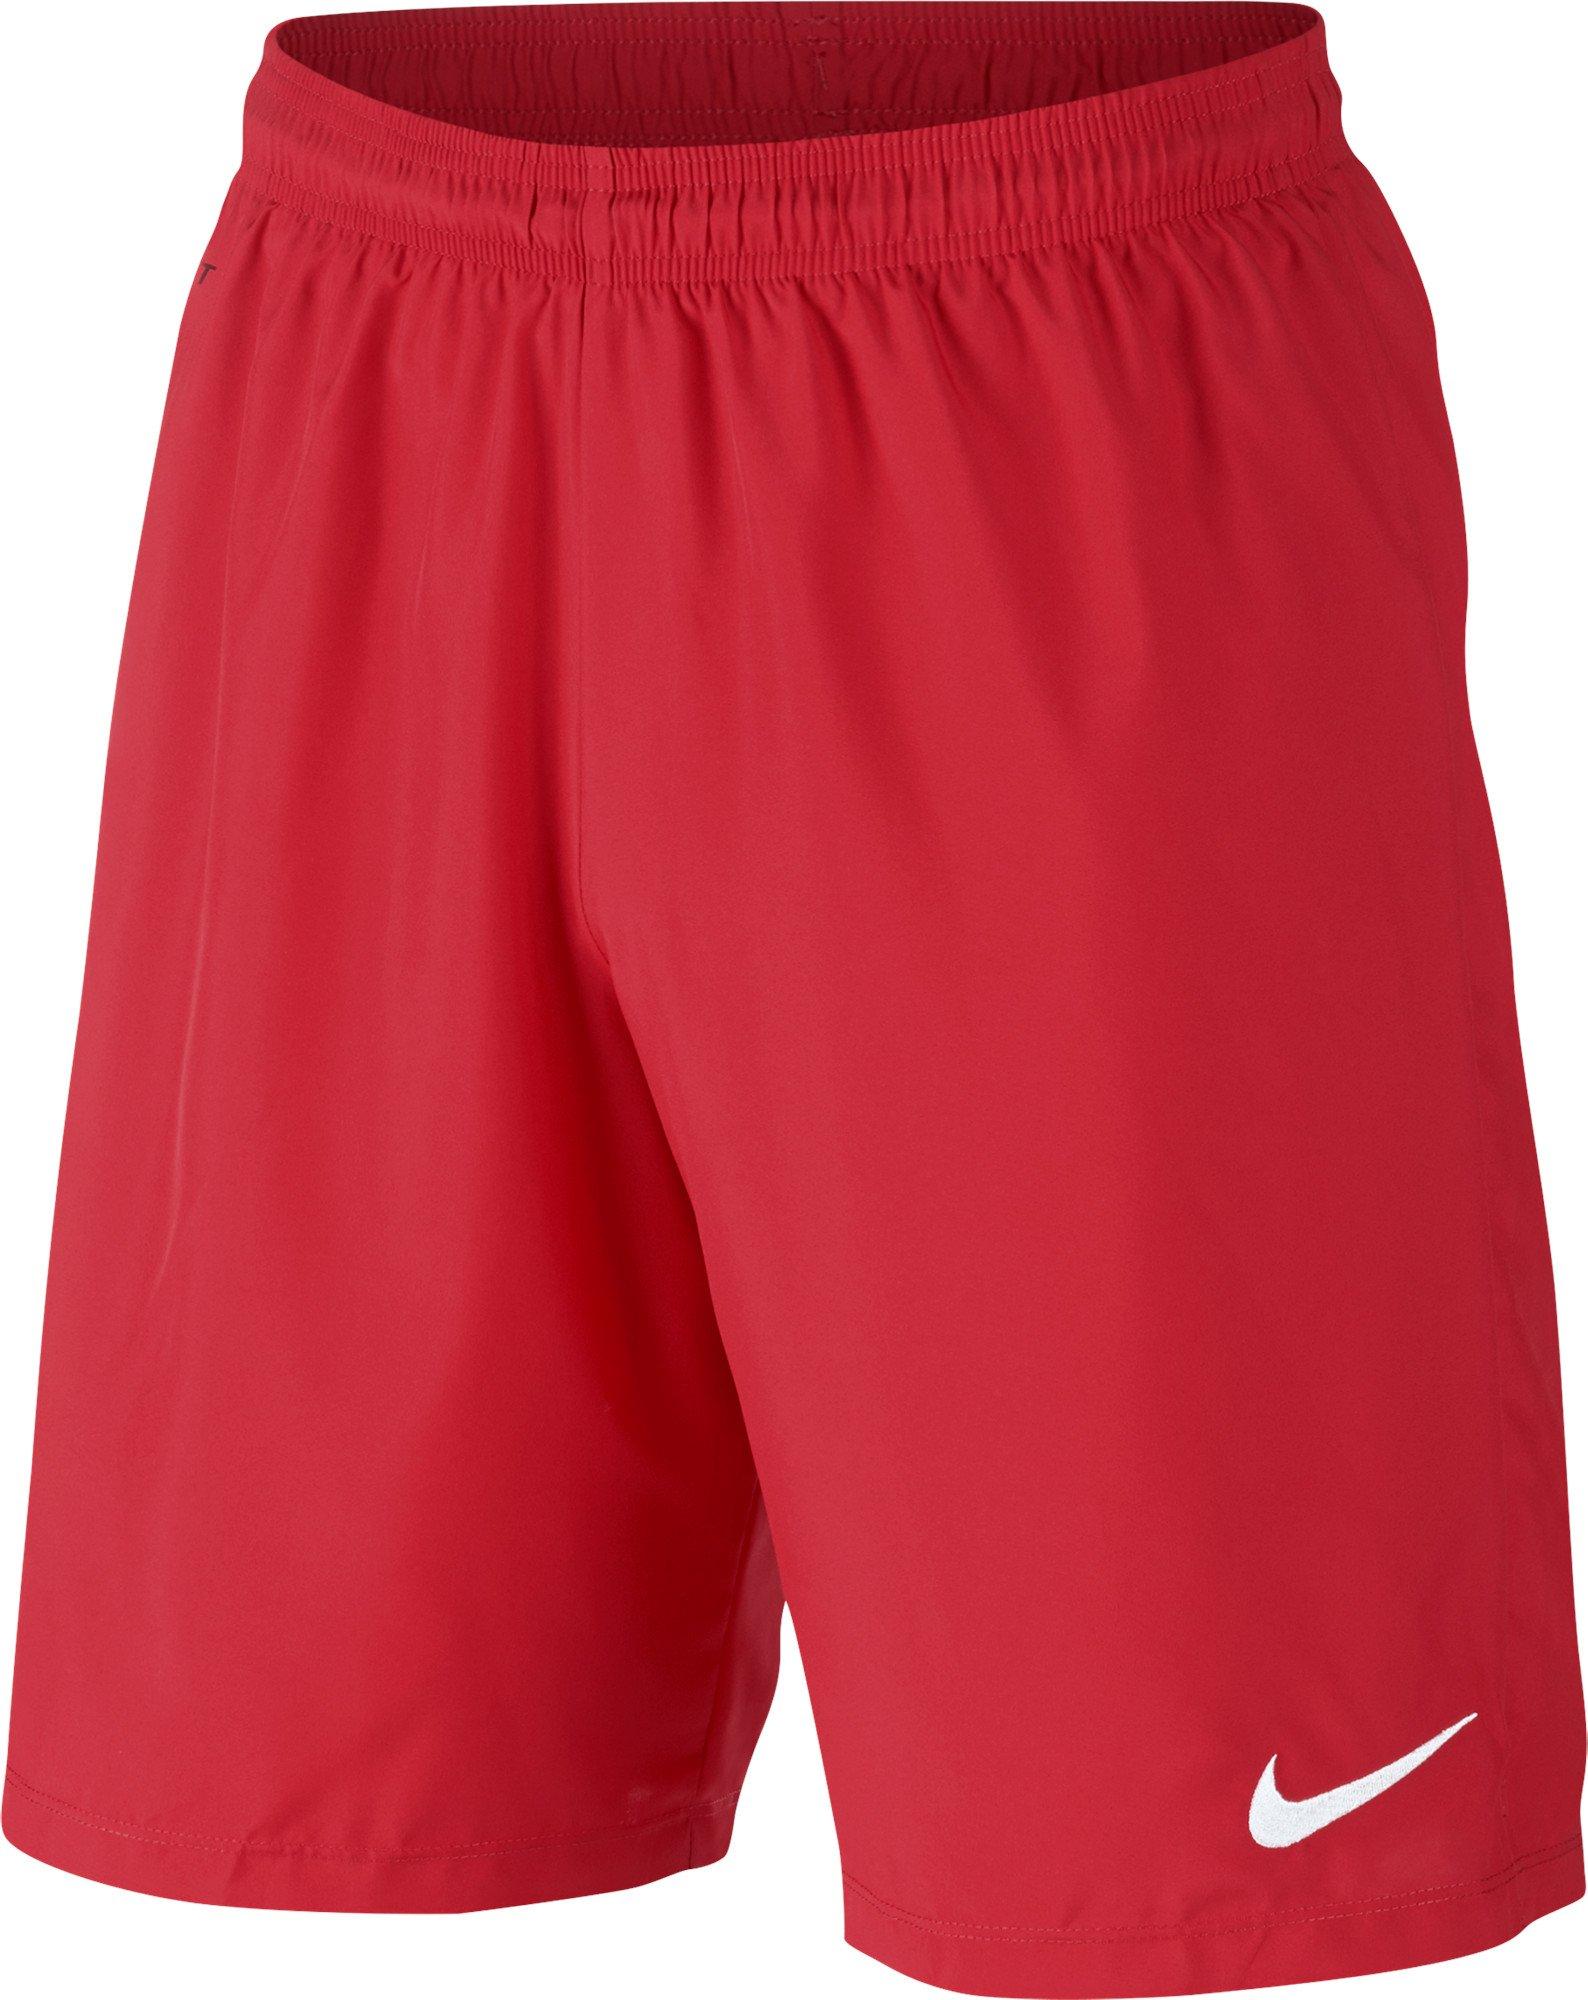 Shorts Nike LASER WOVEN III SHORT NB